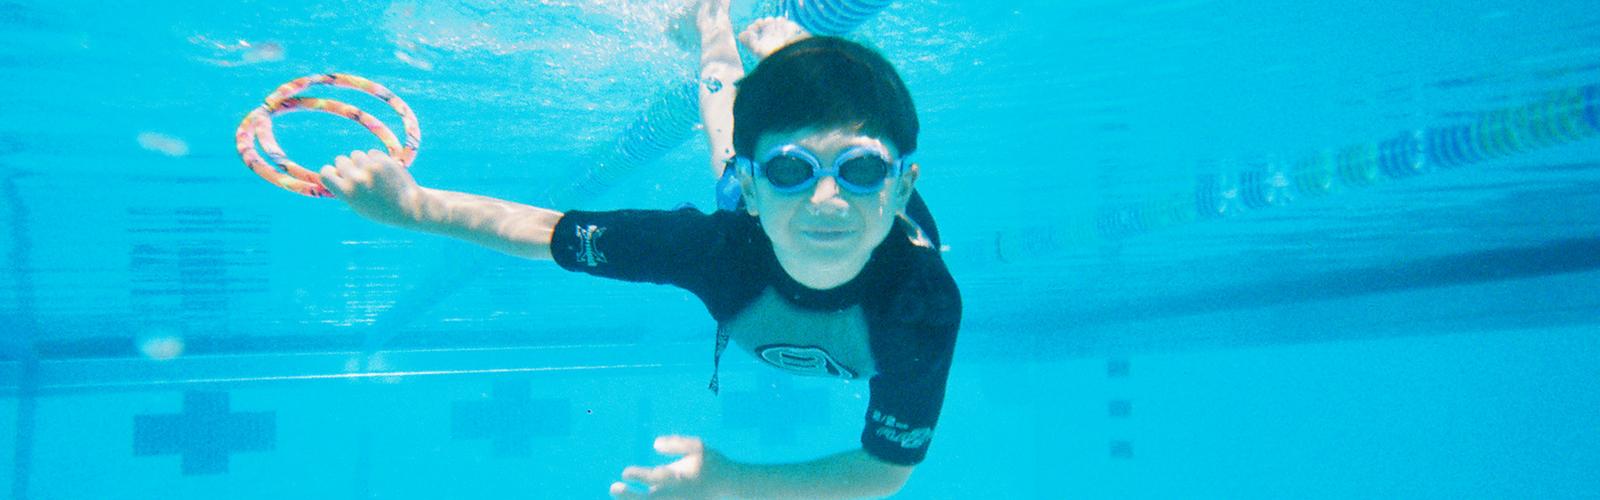 Aquatics Opryd Cityhero